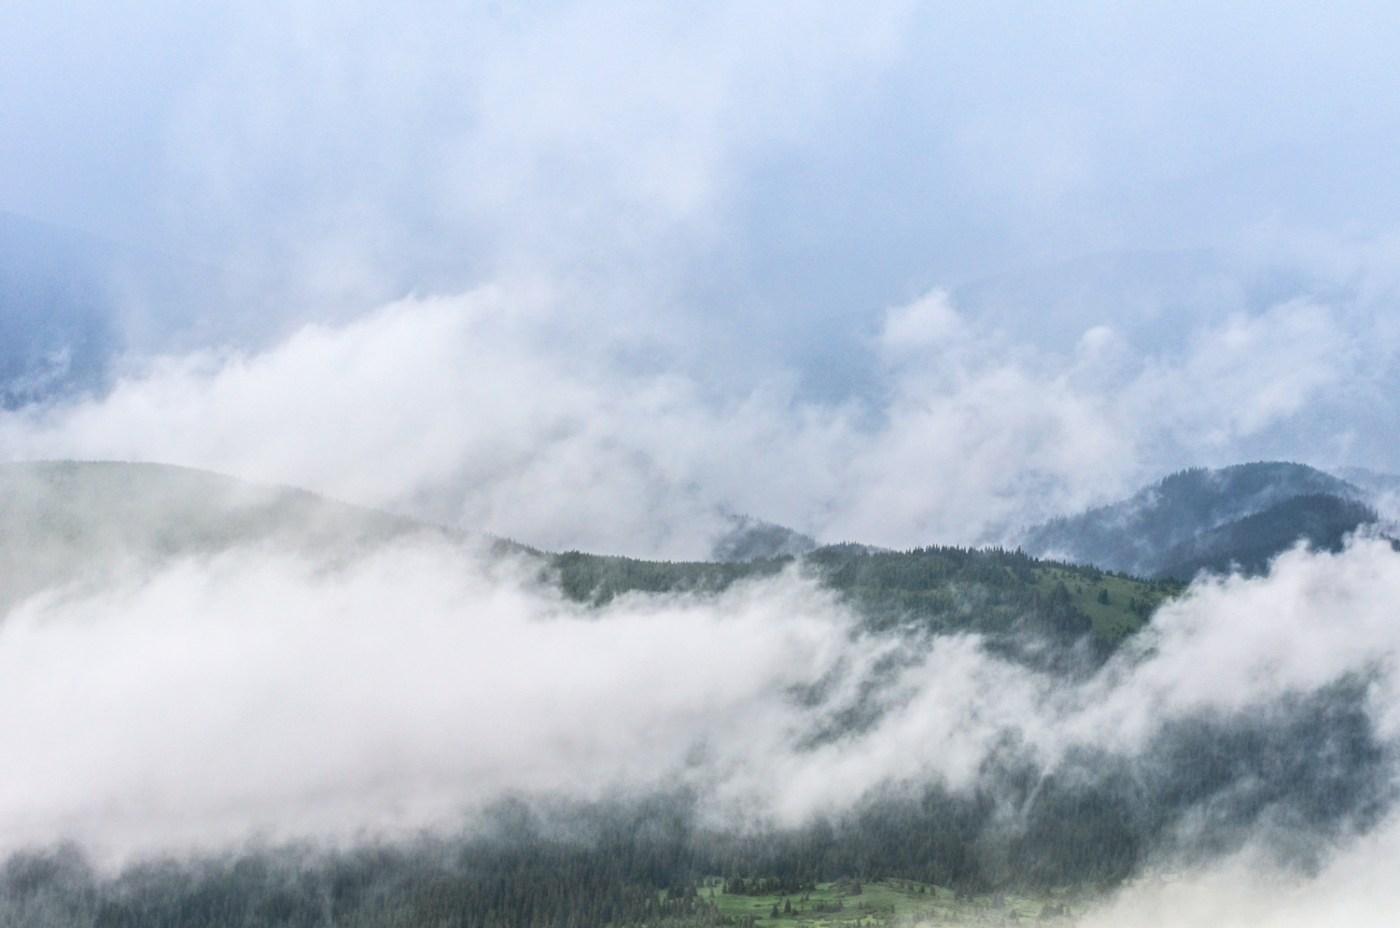 The Carpathian Mountains in Ukraine